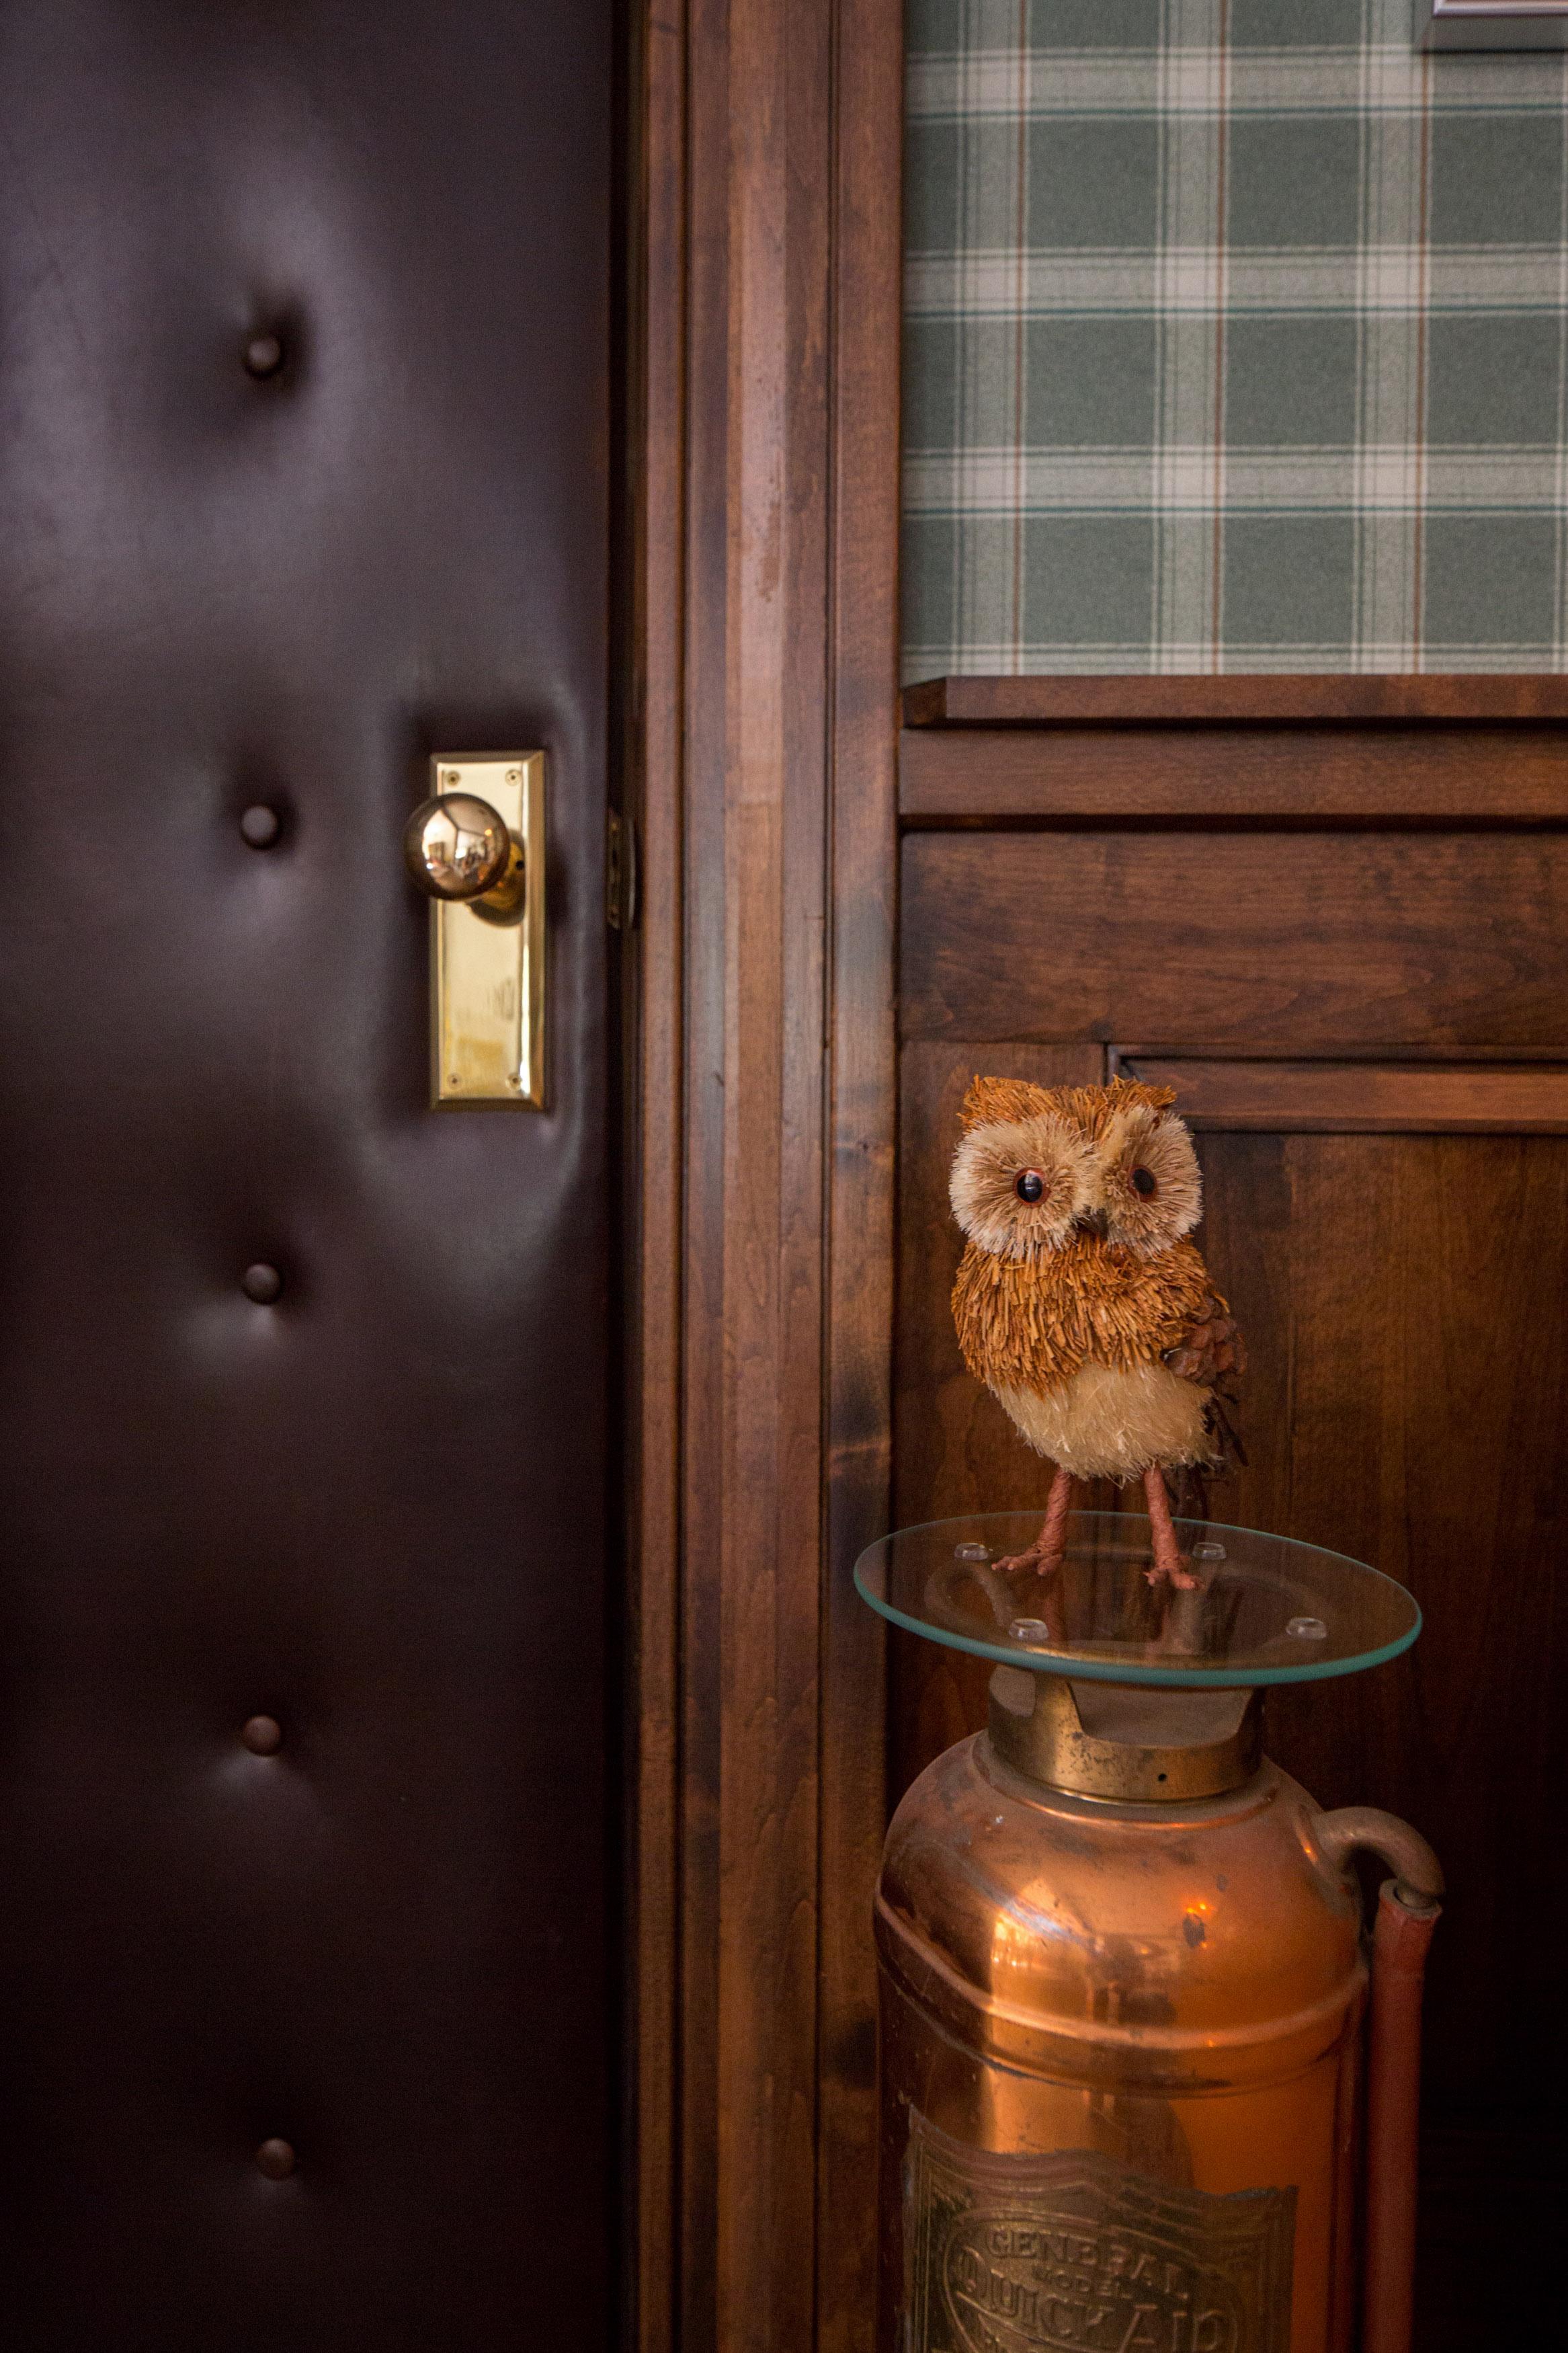 A Little Owl Rests On A Vintage Copper Fire Extinguisher.